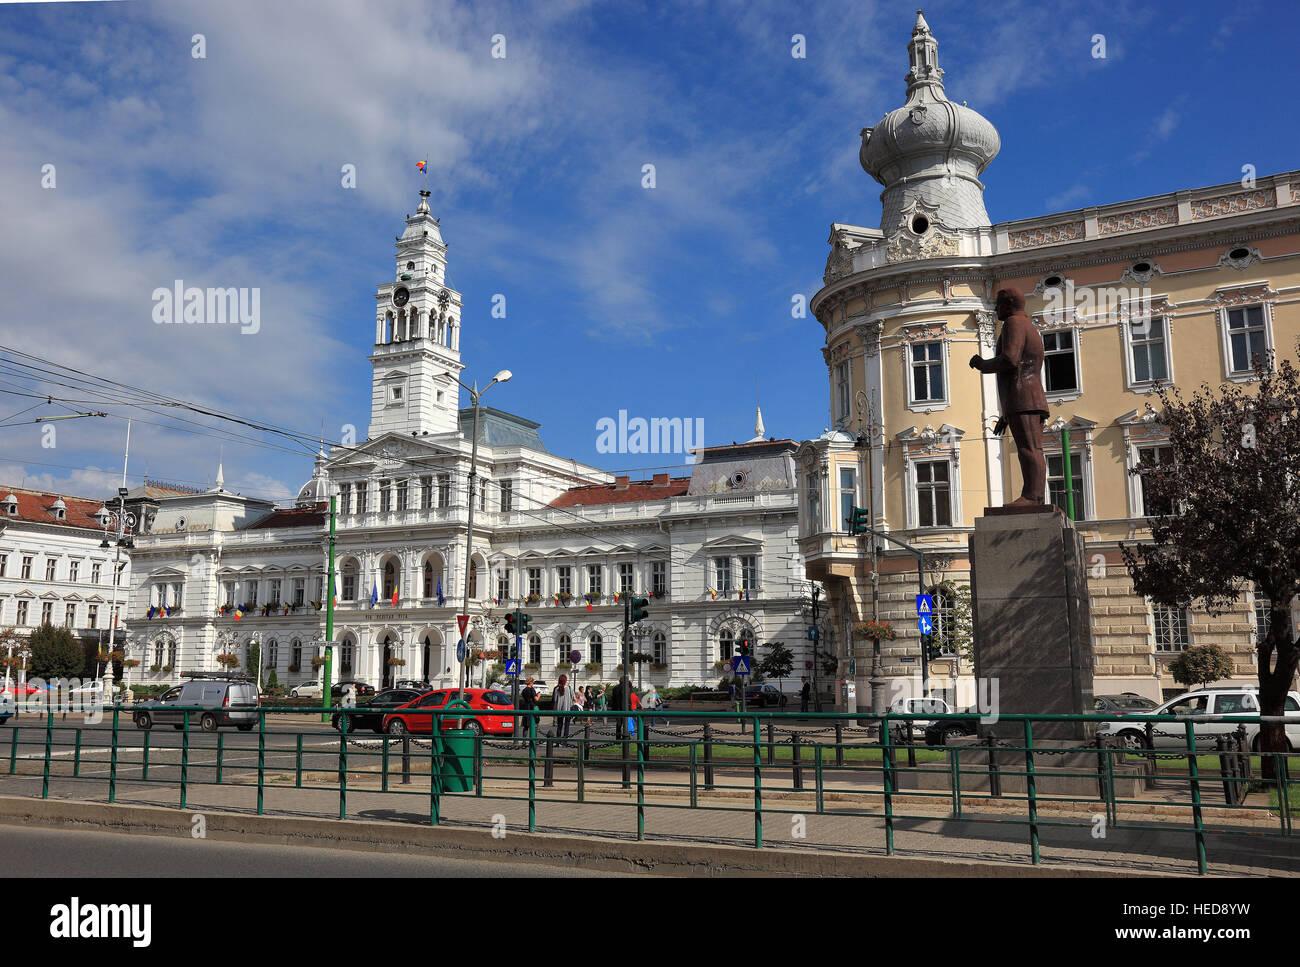 Arad Rumänien vlaicu stock photos vlaicu stock images alamy